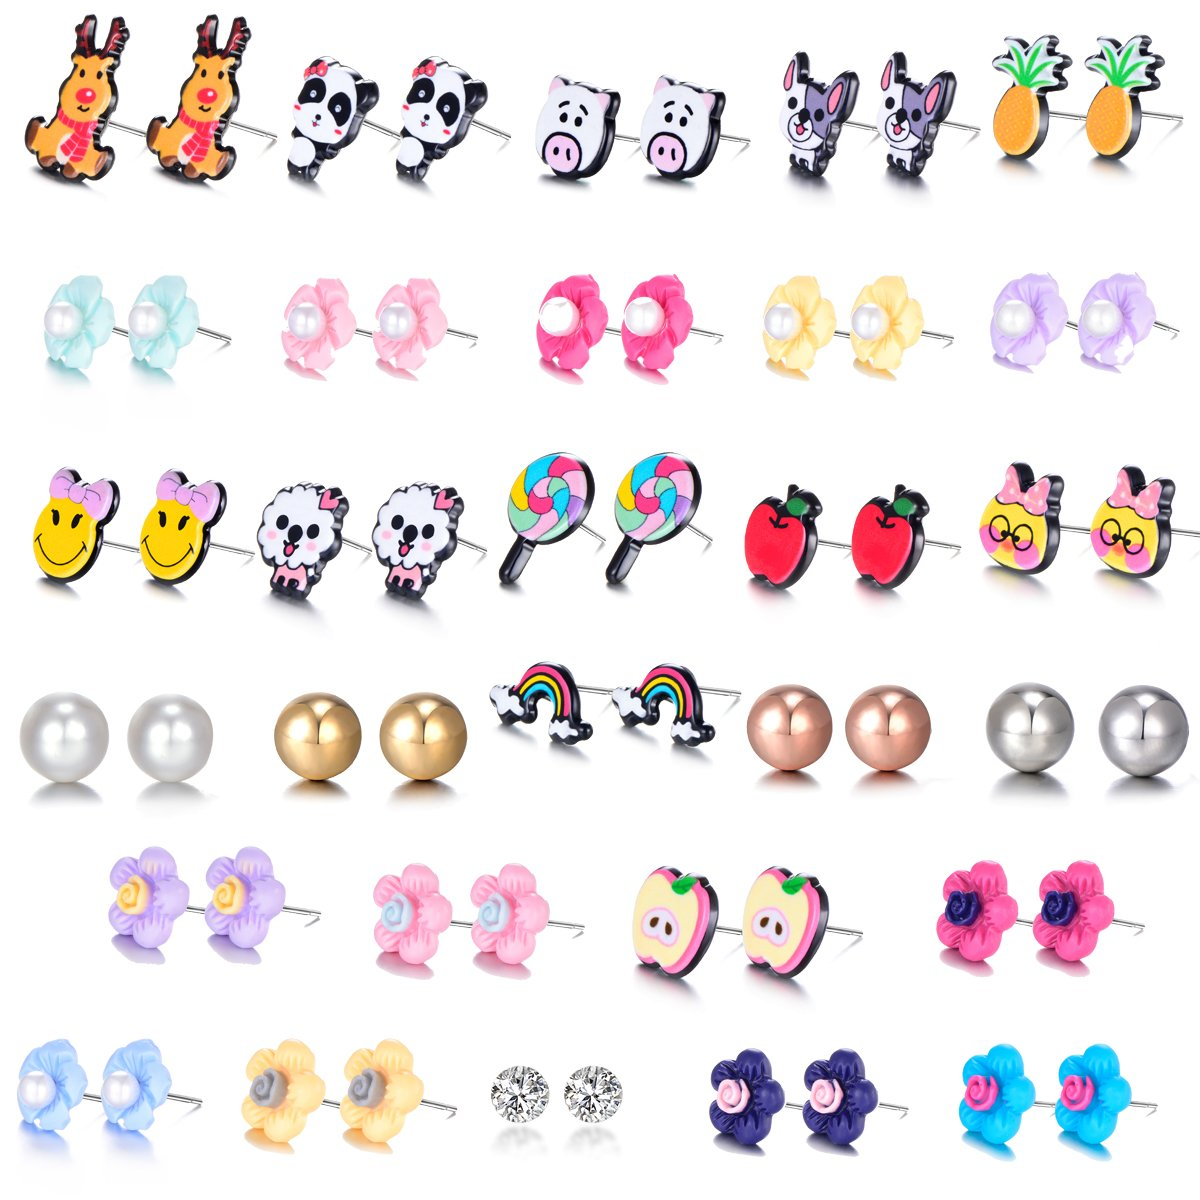 Mixed Cute Fox Reindeer Pineapple Apple Rainbow Lollipop Pig Flower Rhinestones Faux Pearl Stud Earrings Gift Set with Stainless Post for Girl Women luoyue